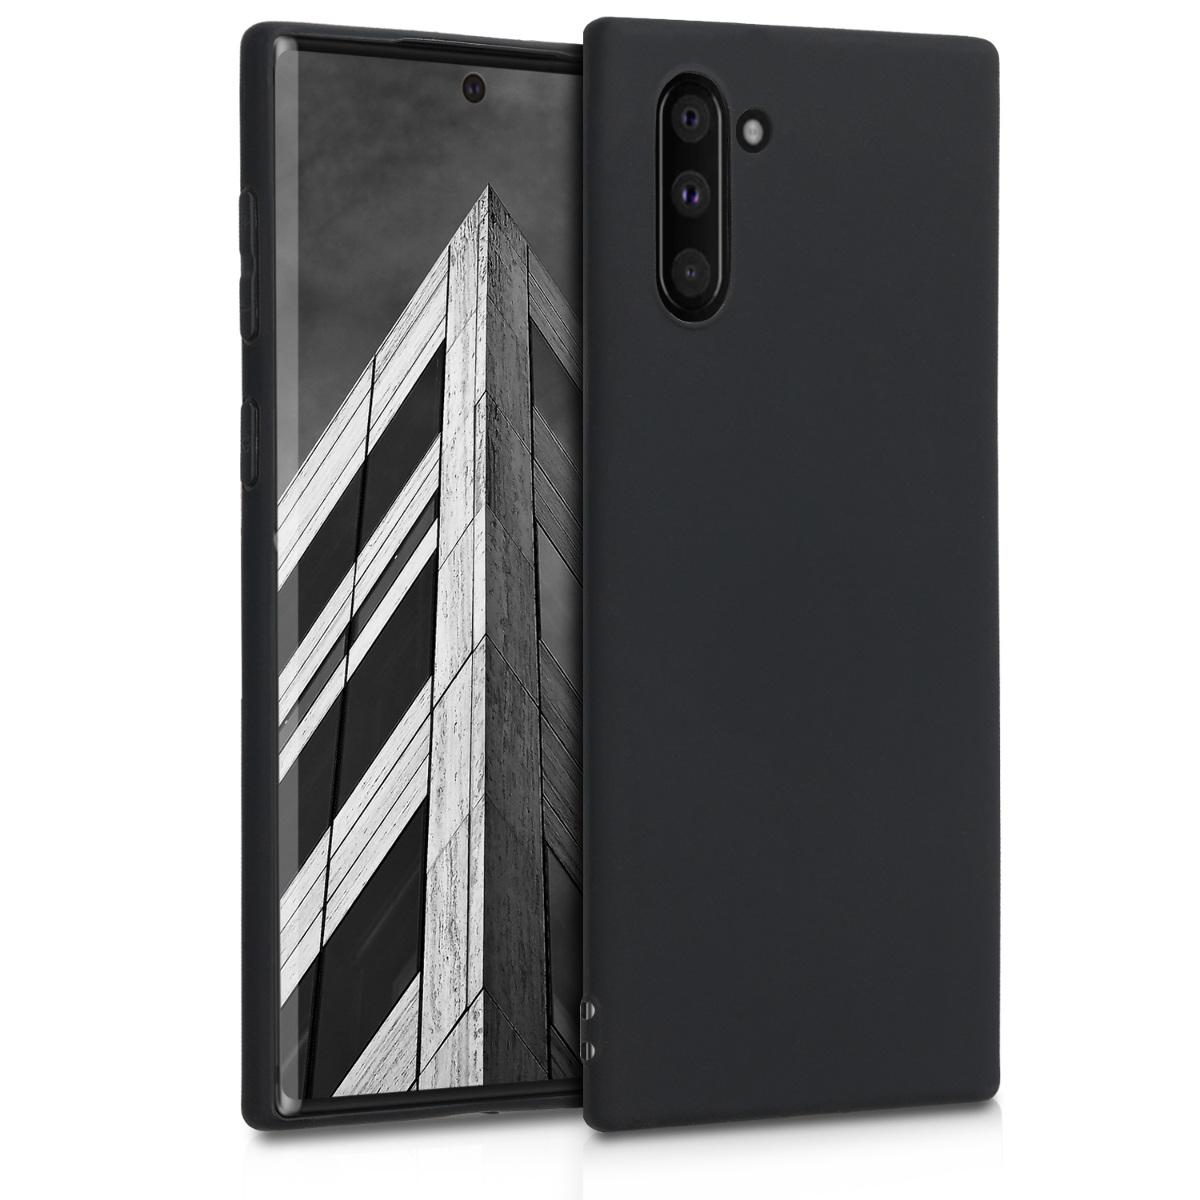 KW Θήκη Σιλικόνης Samsung Galaxy Note 10 - Black Matte (49274.47)